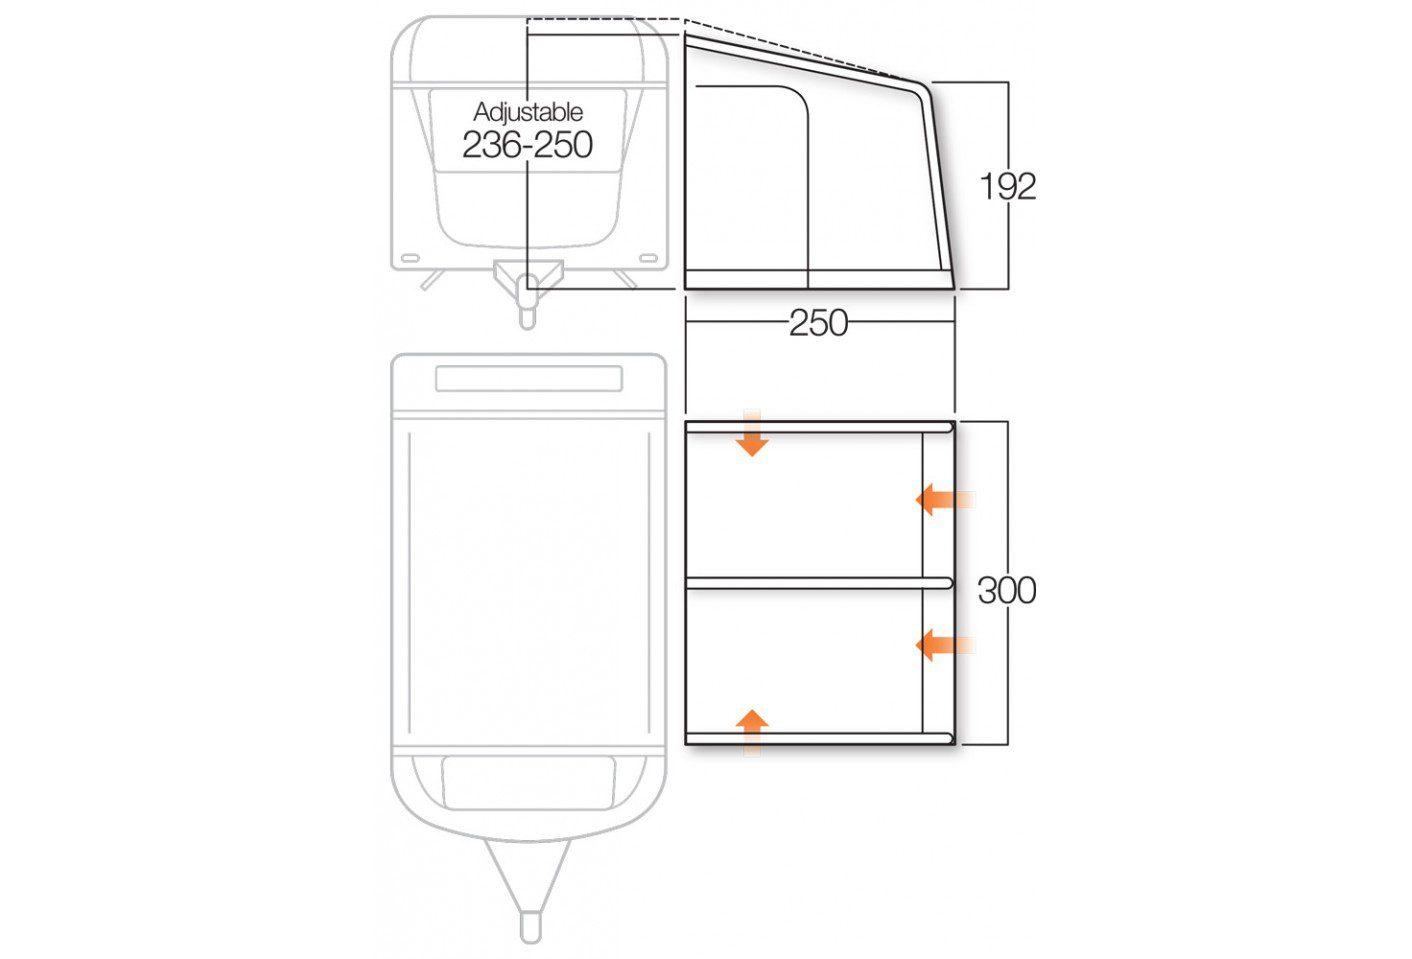 Vango Braemar II 300 awning floorplan 2018